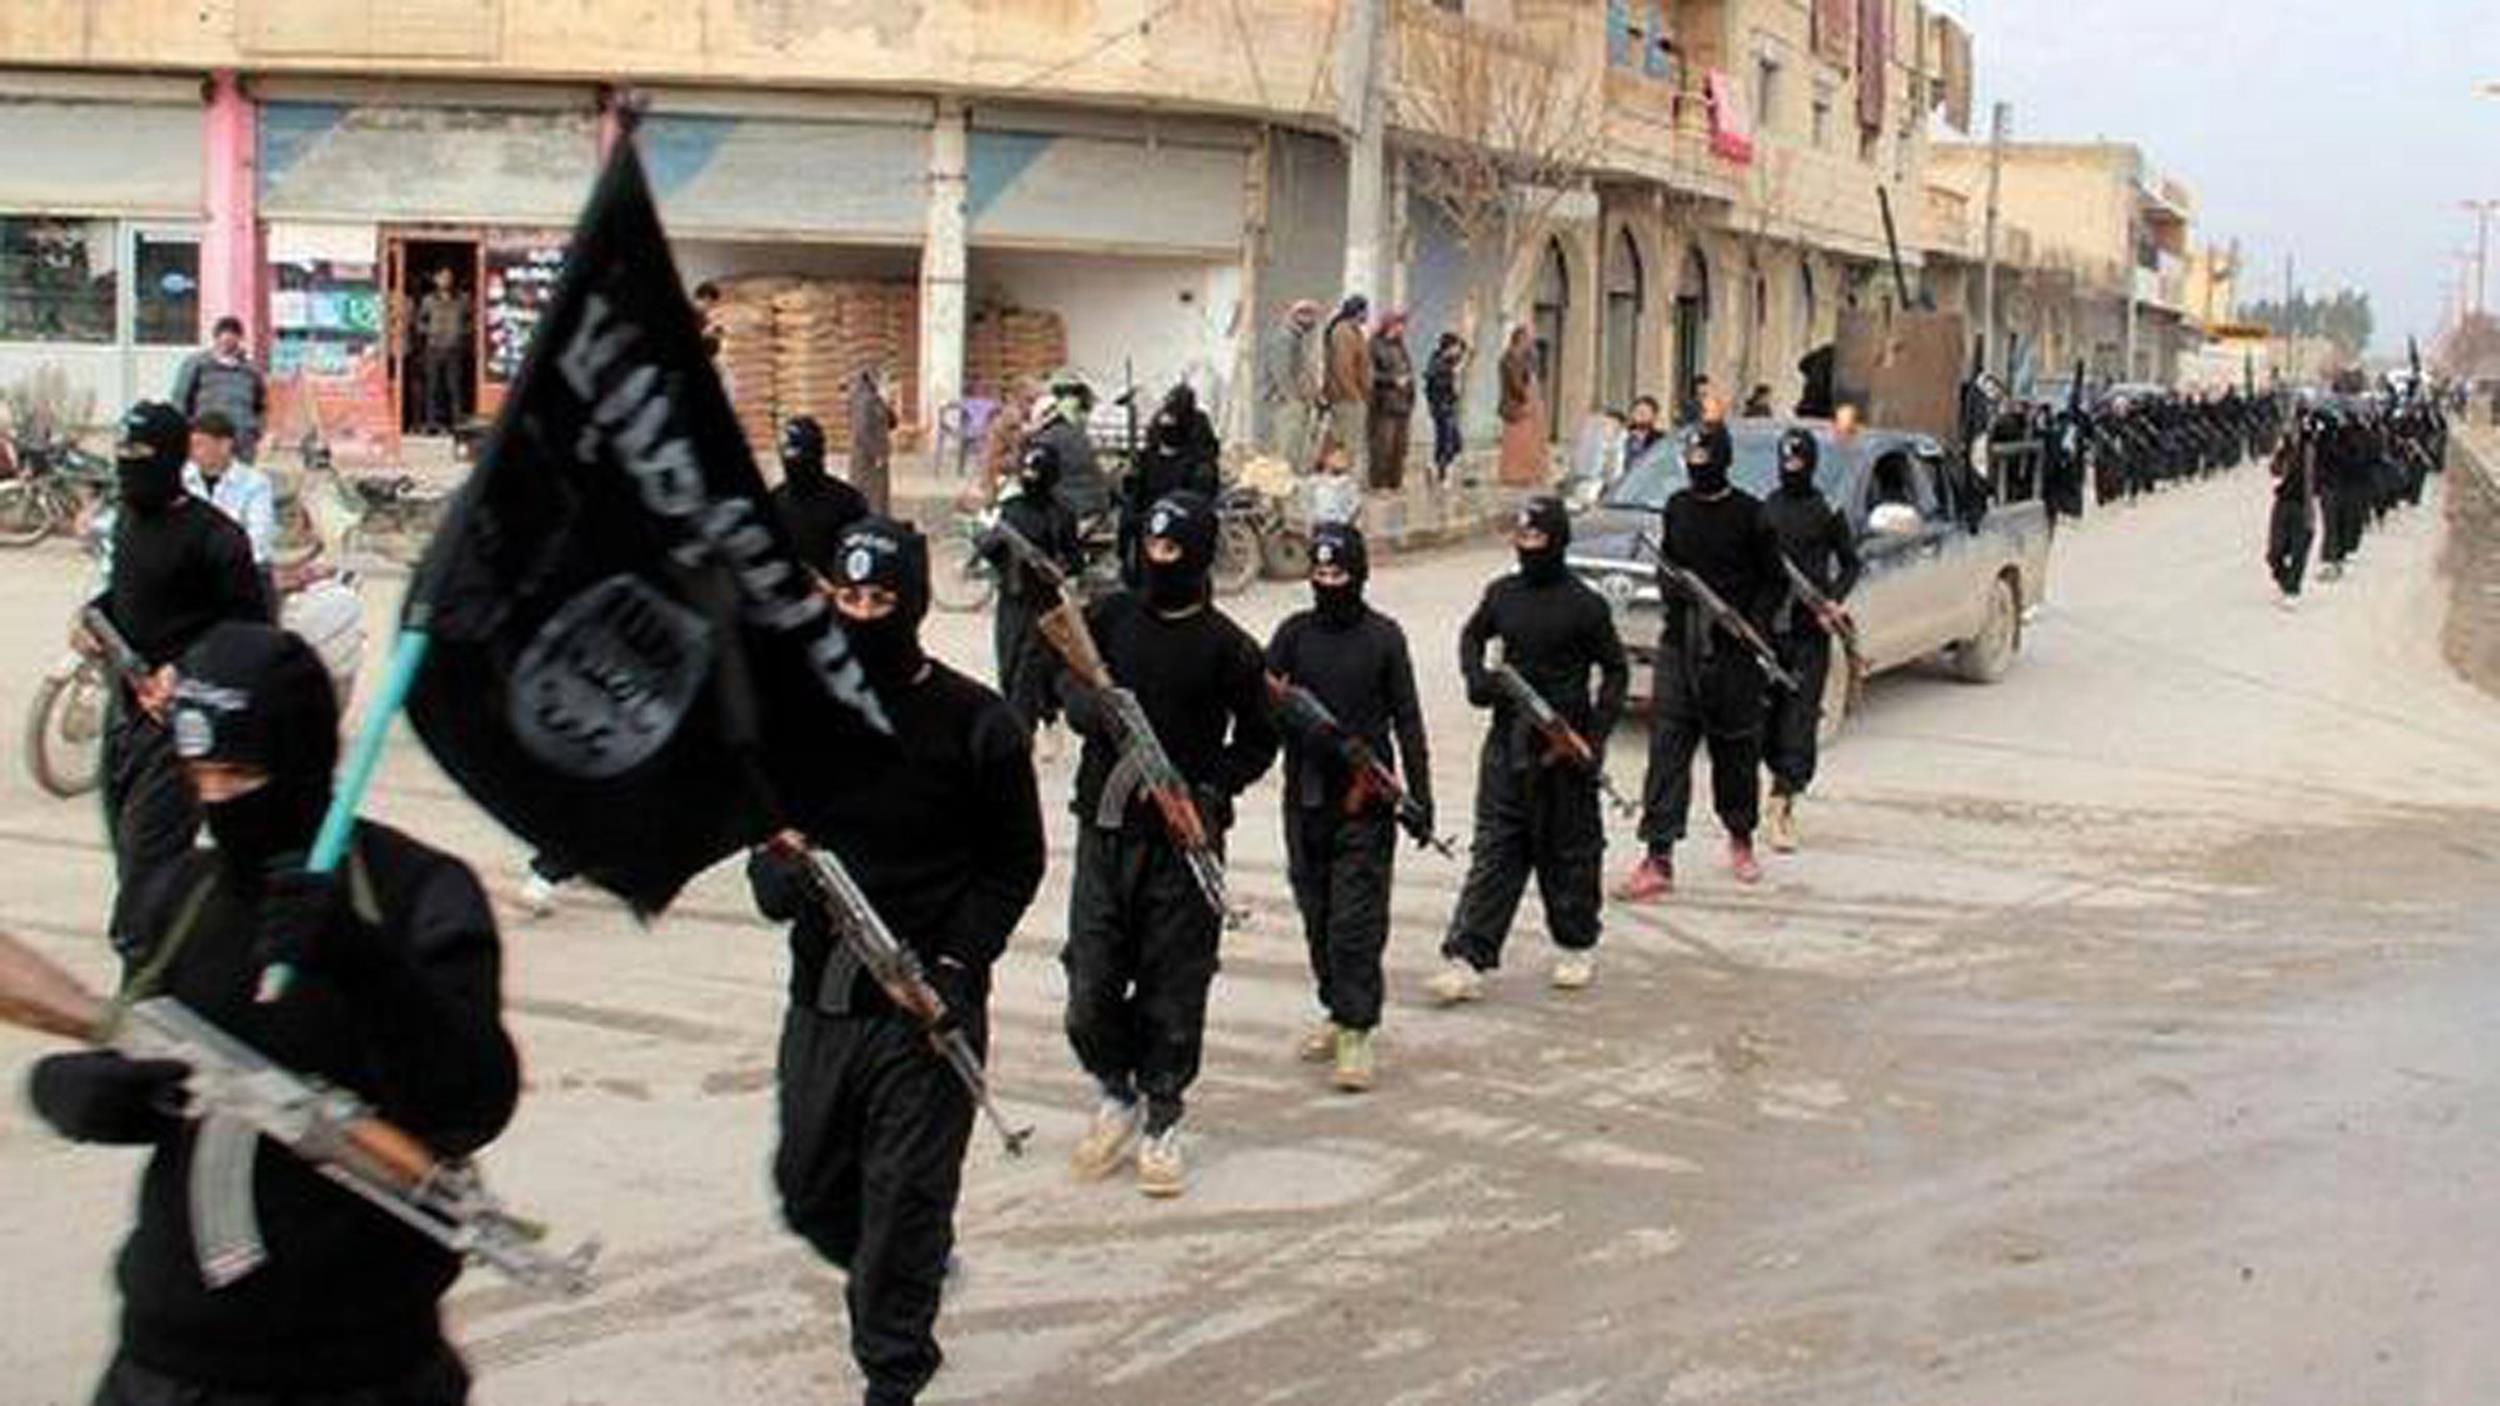 Irak/Syrië. Complete mislukking van strategie van het VS-imperialisme